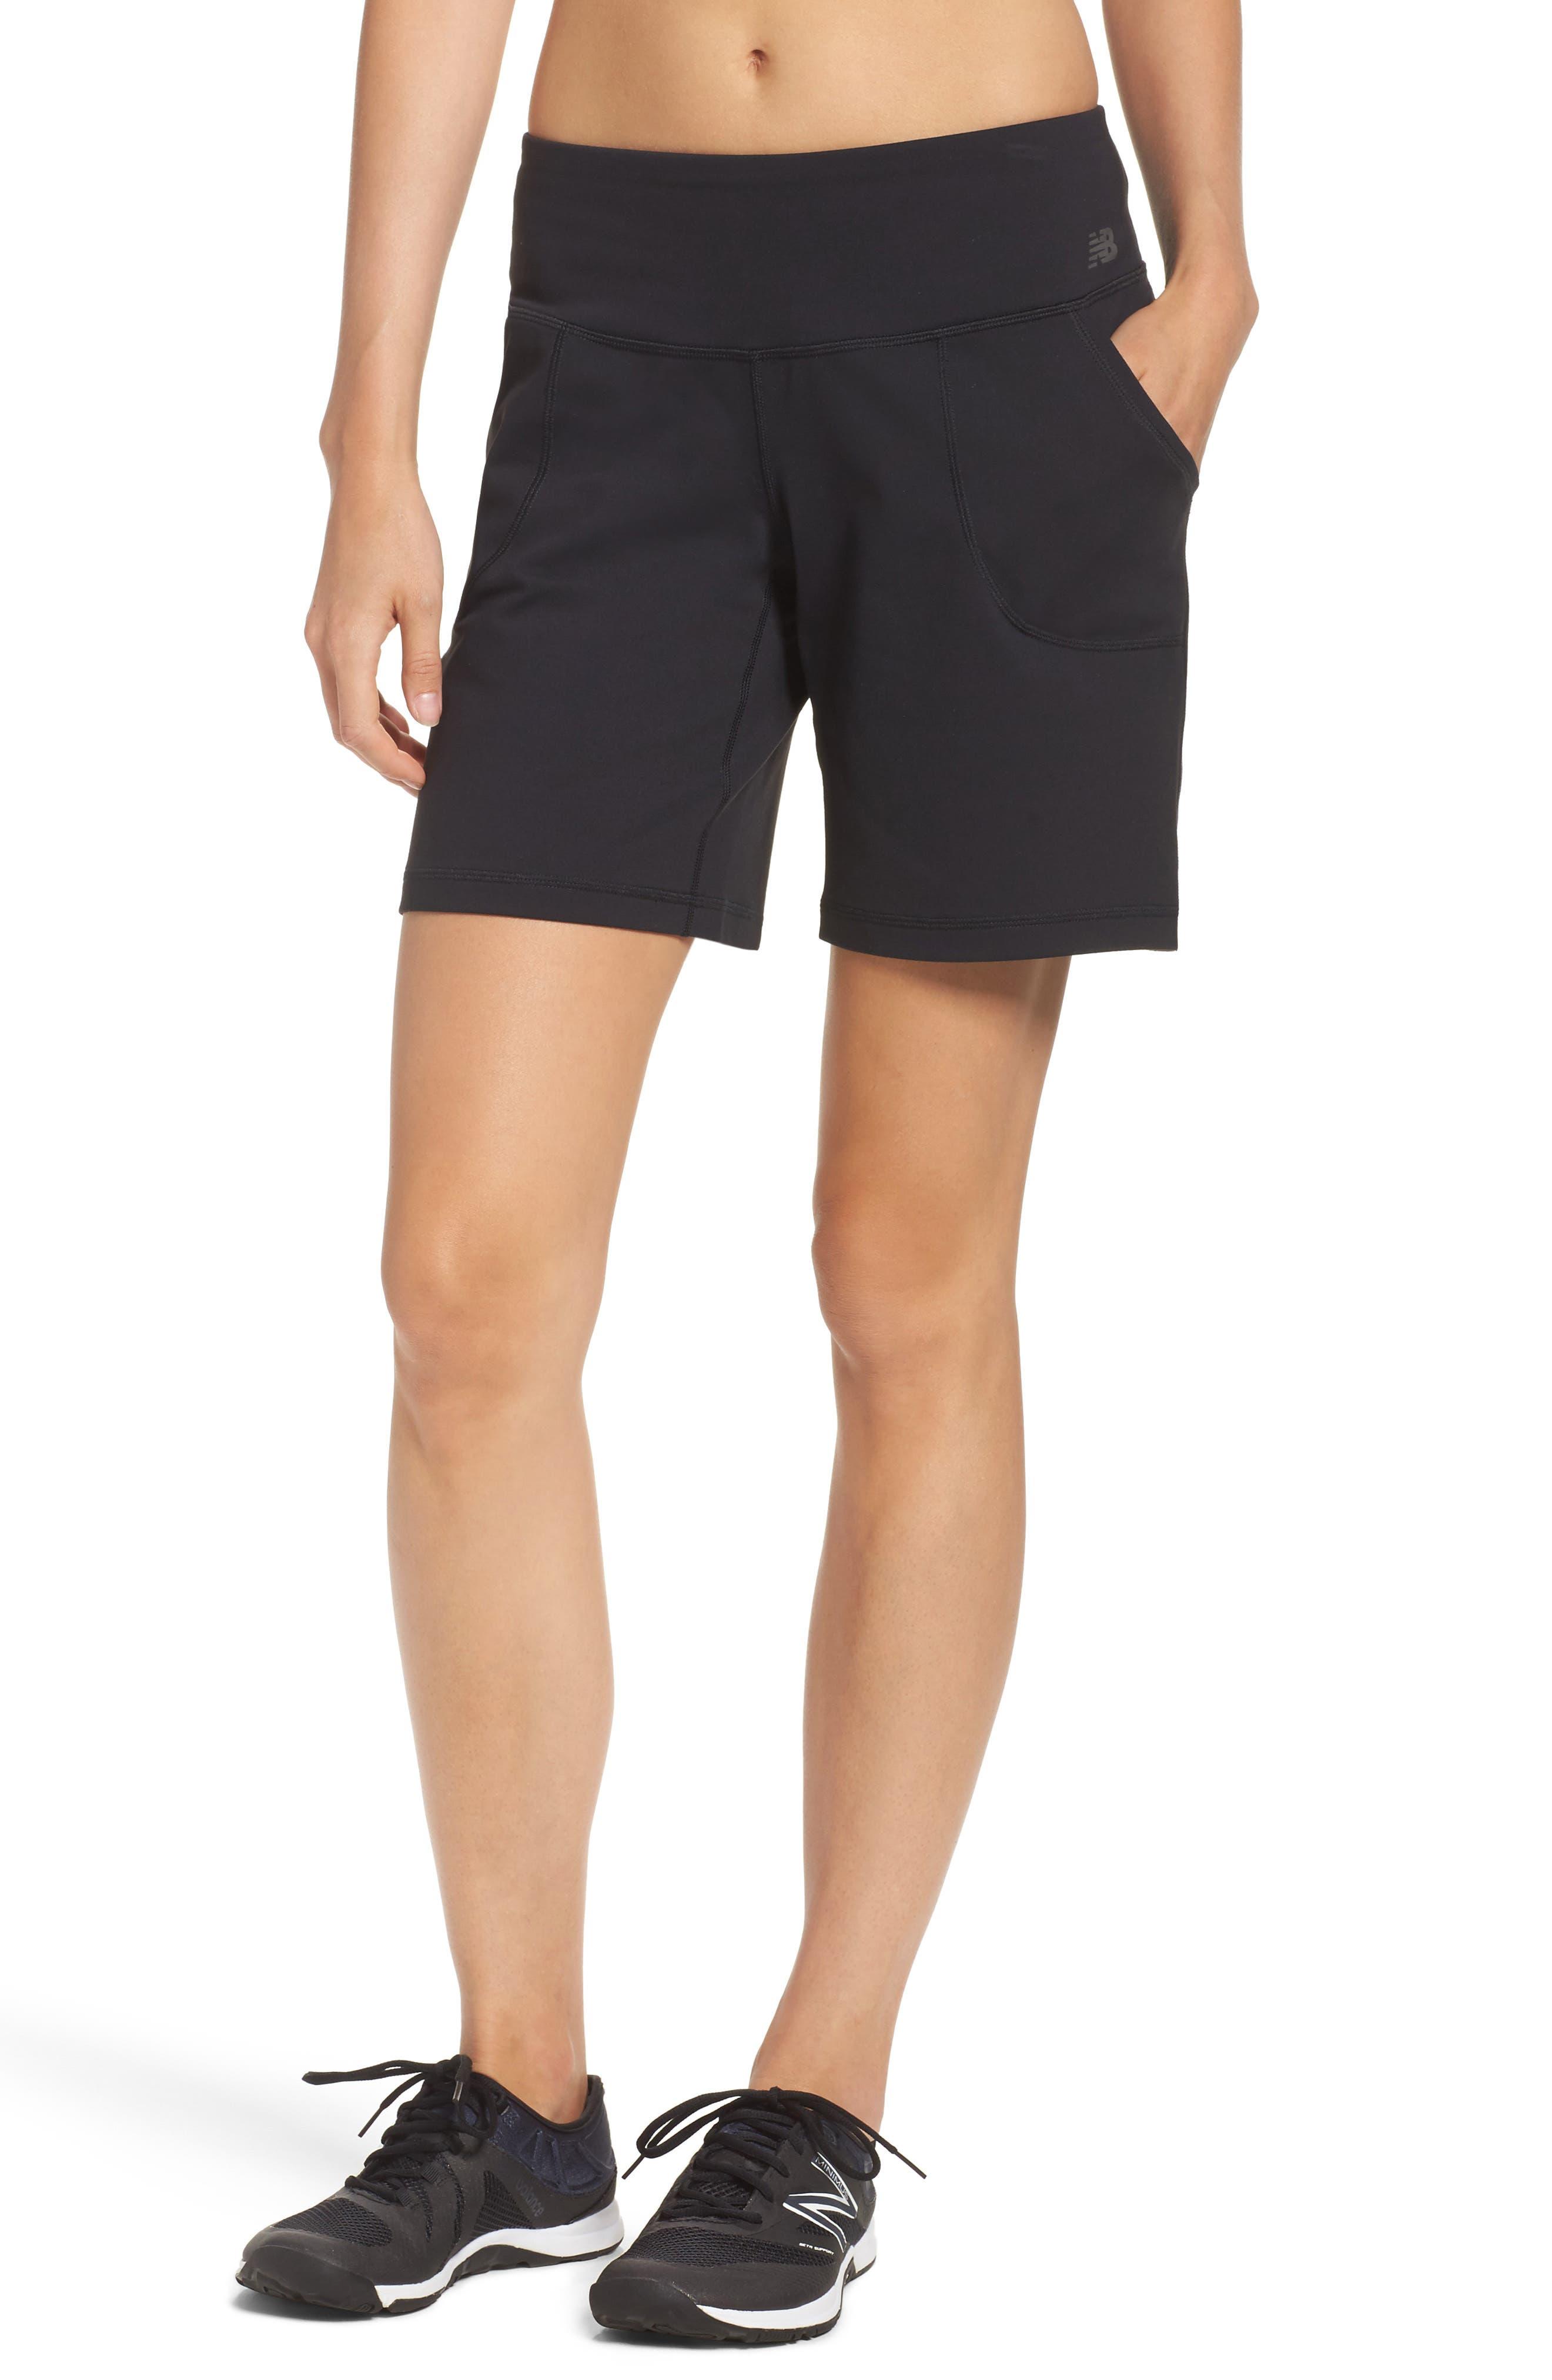 Alternate Image 1 Selected - New Balance 'Premium Performance' Sport Bermuda Shorts